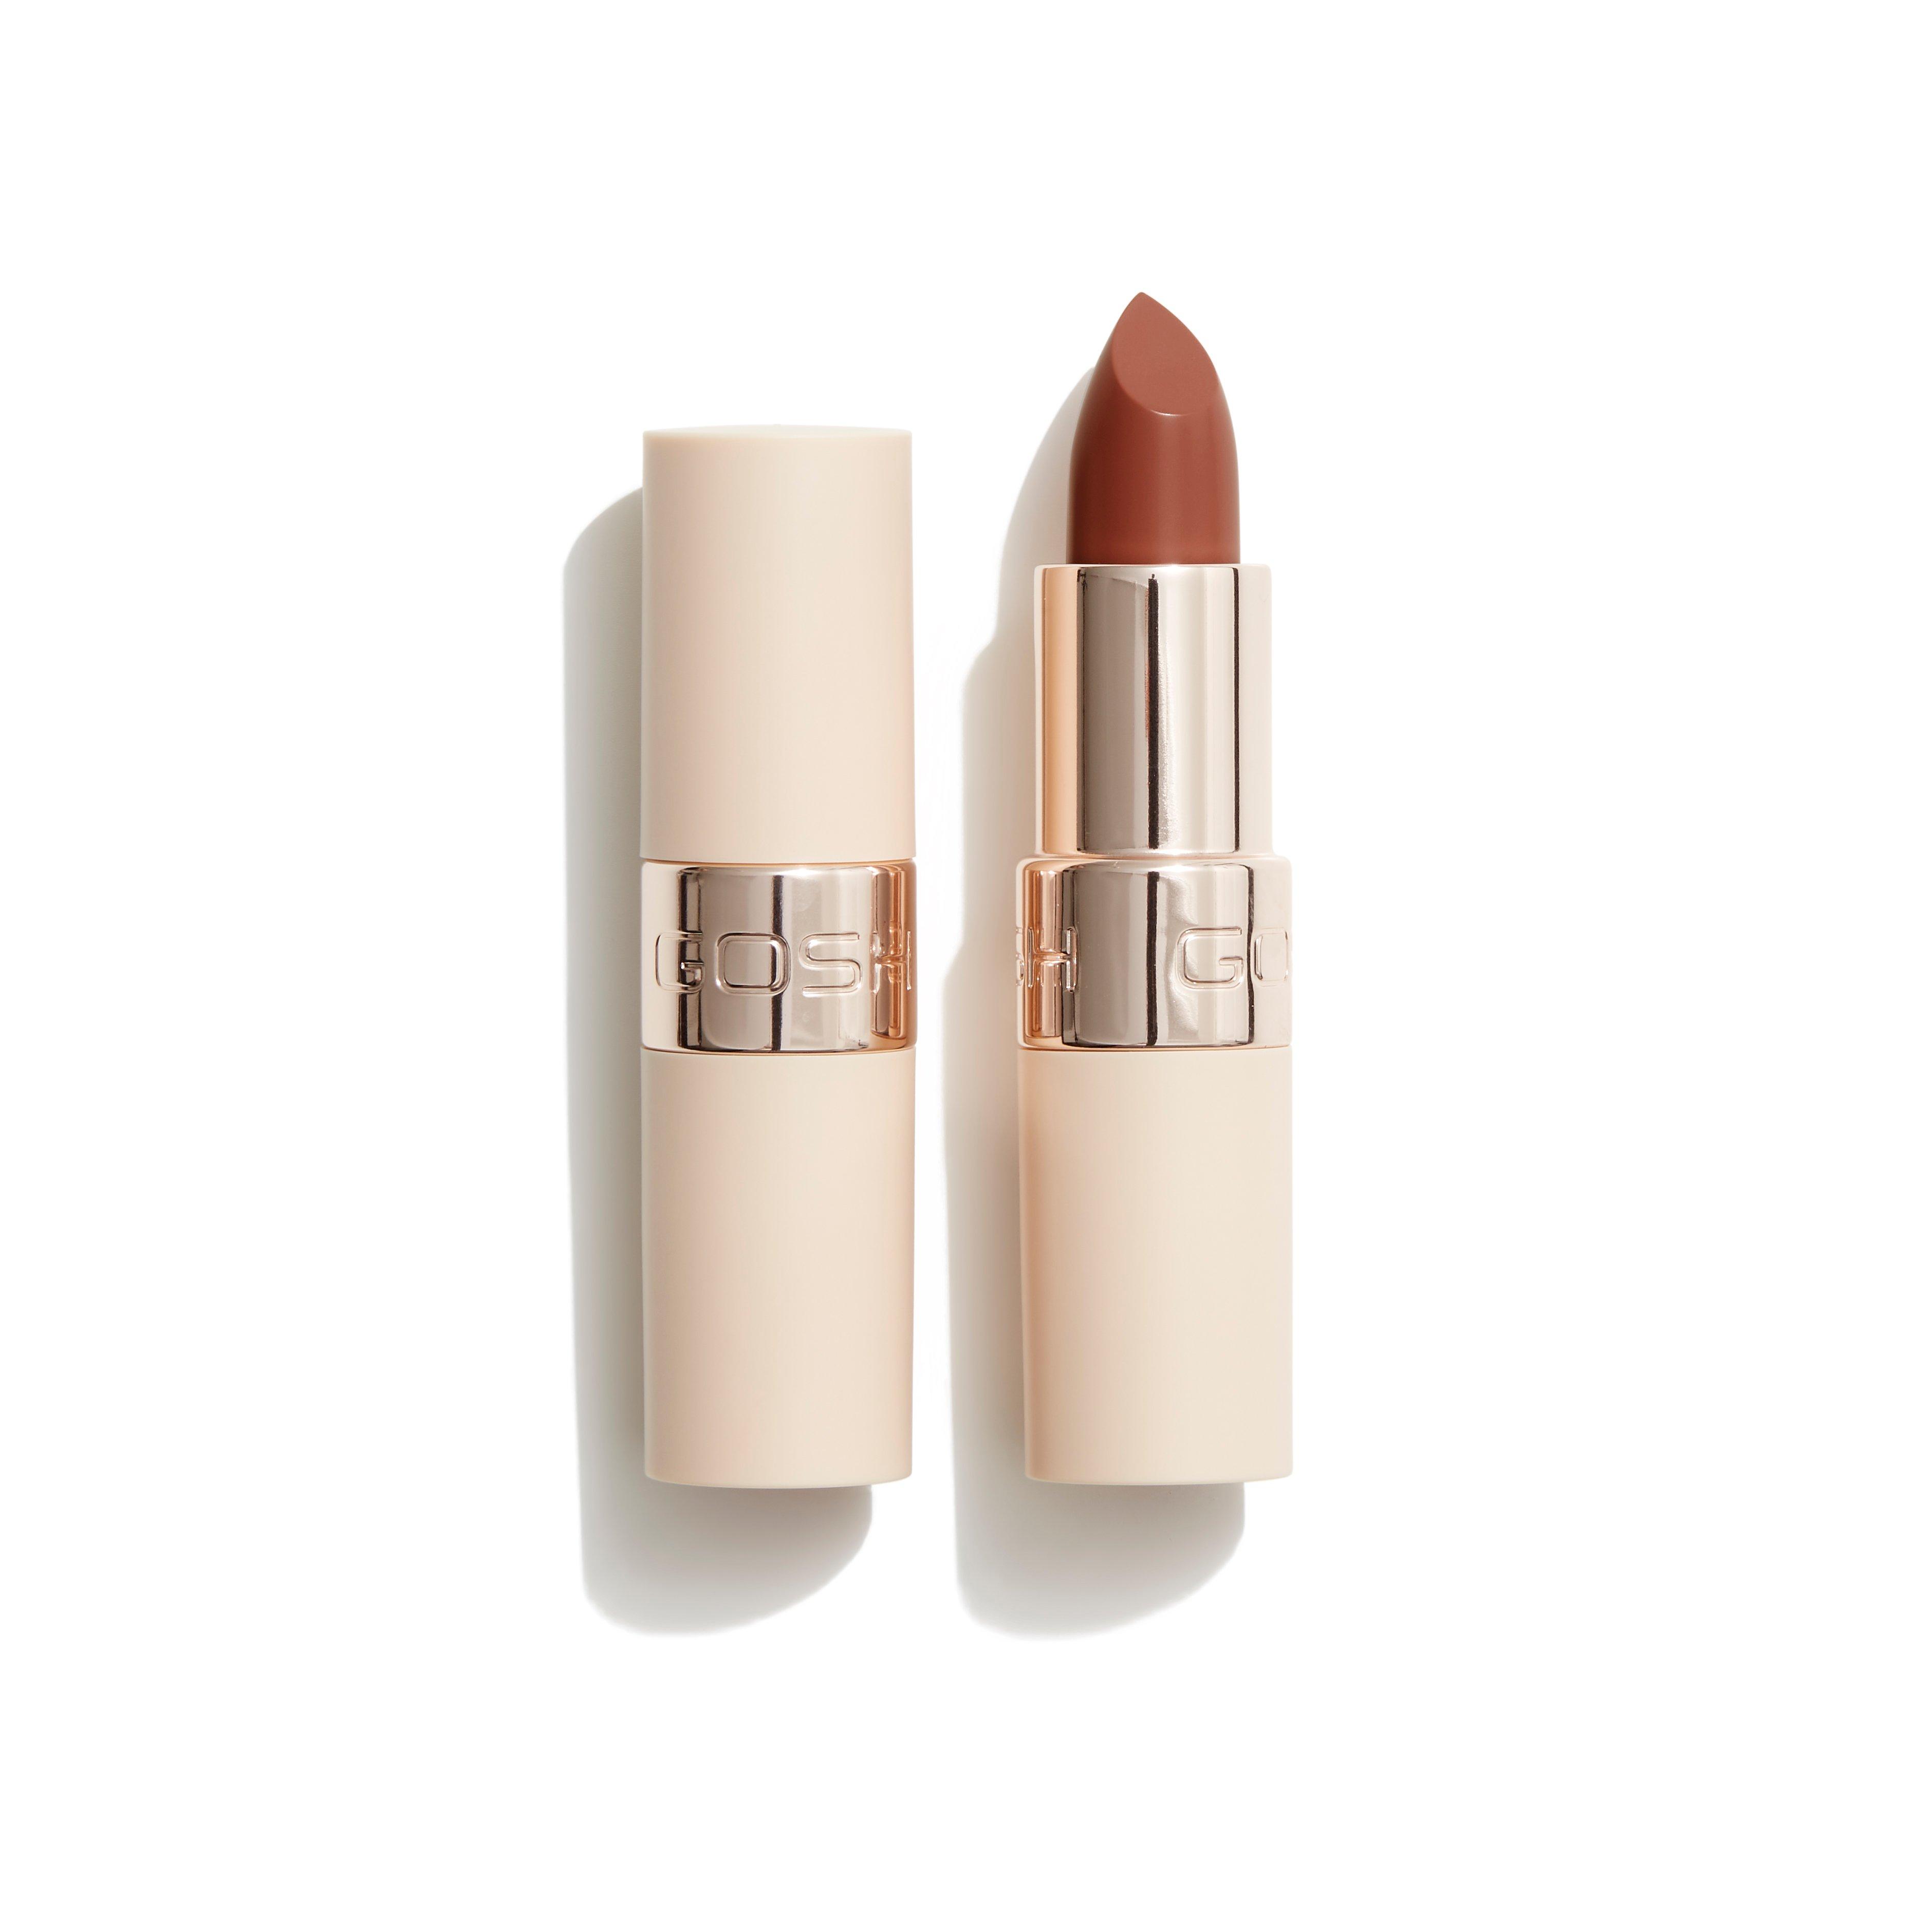 GOSH Copenhagen - Luxury Nude Lips - 005 Bare